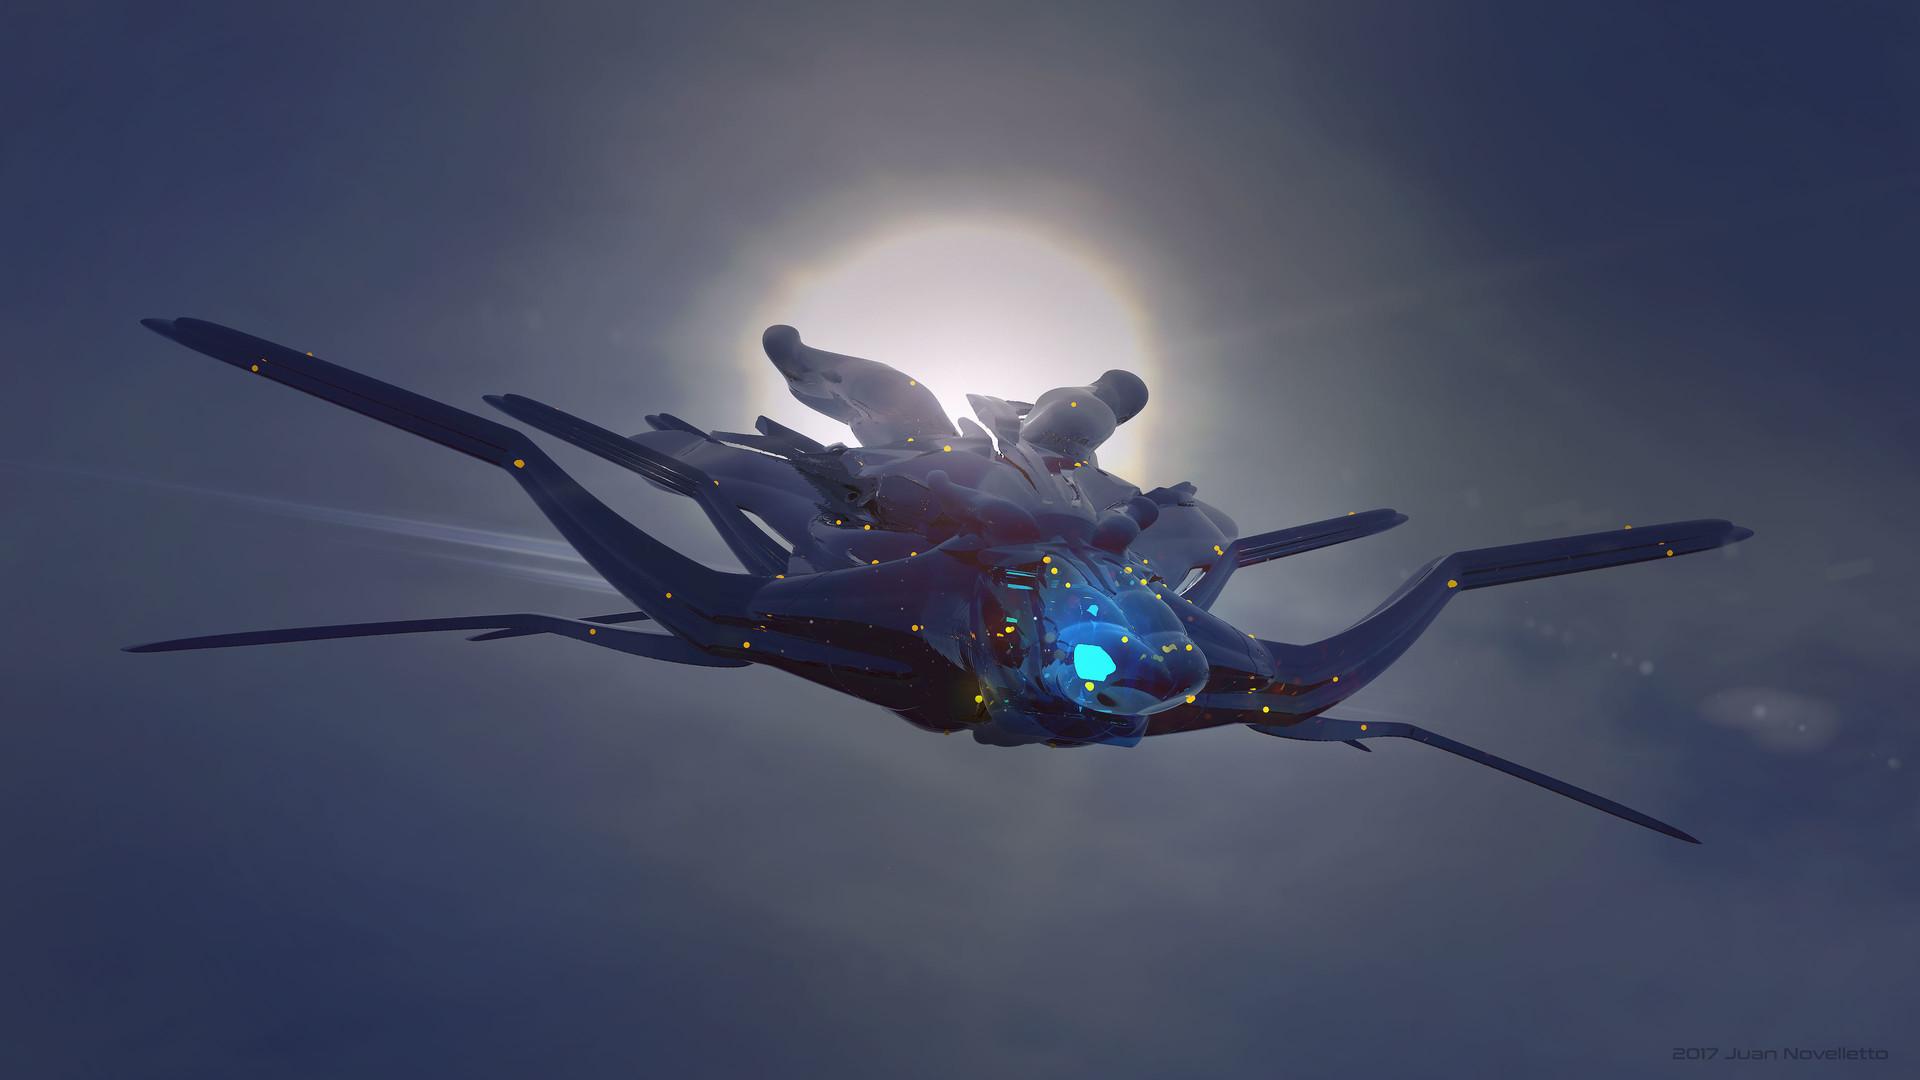 Juan novelletto alien ship02c